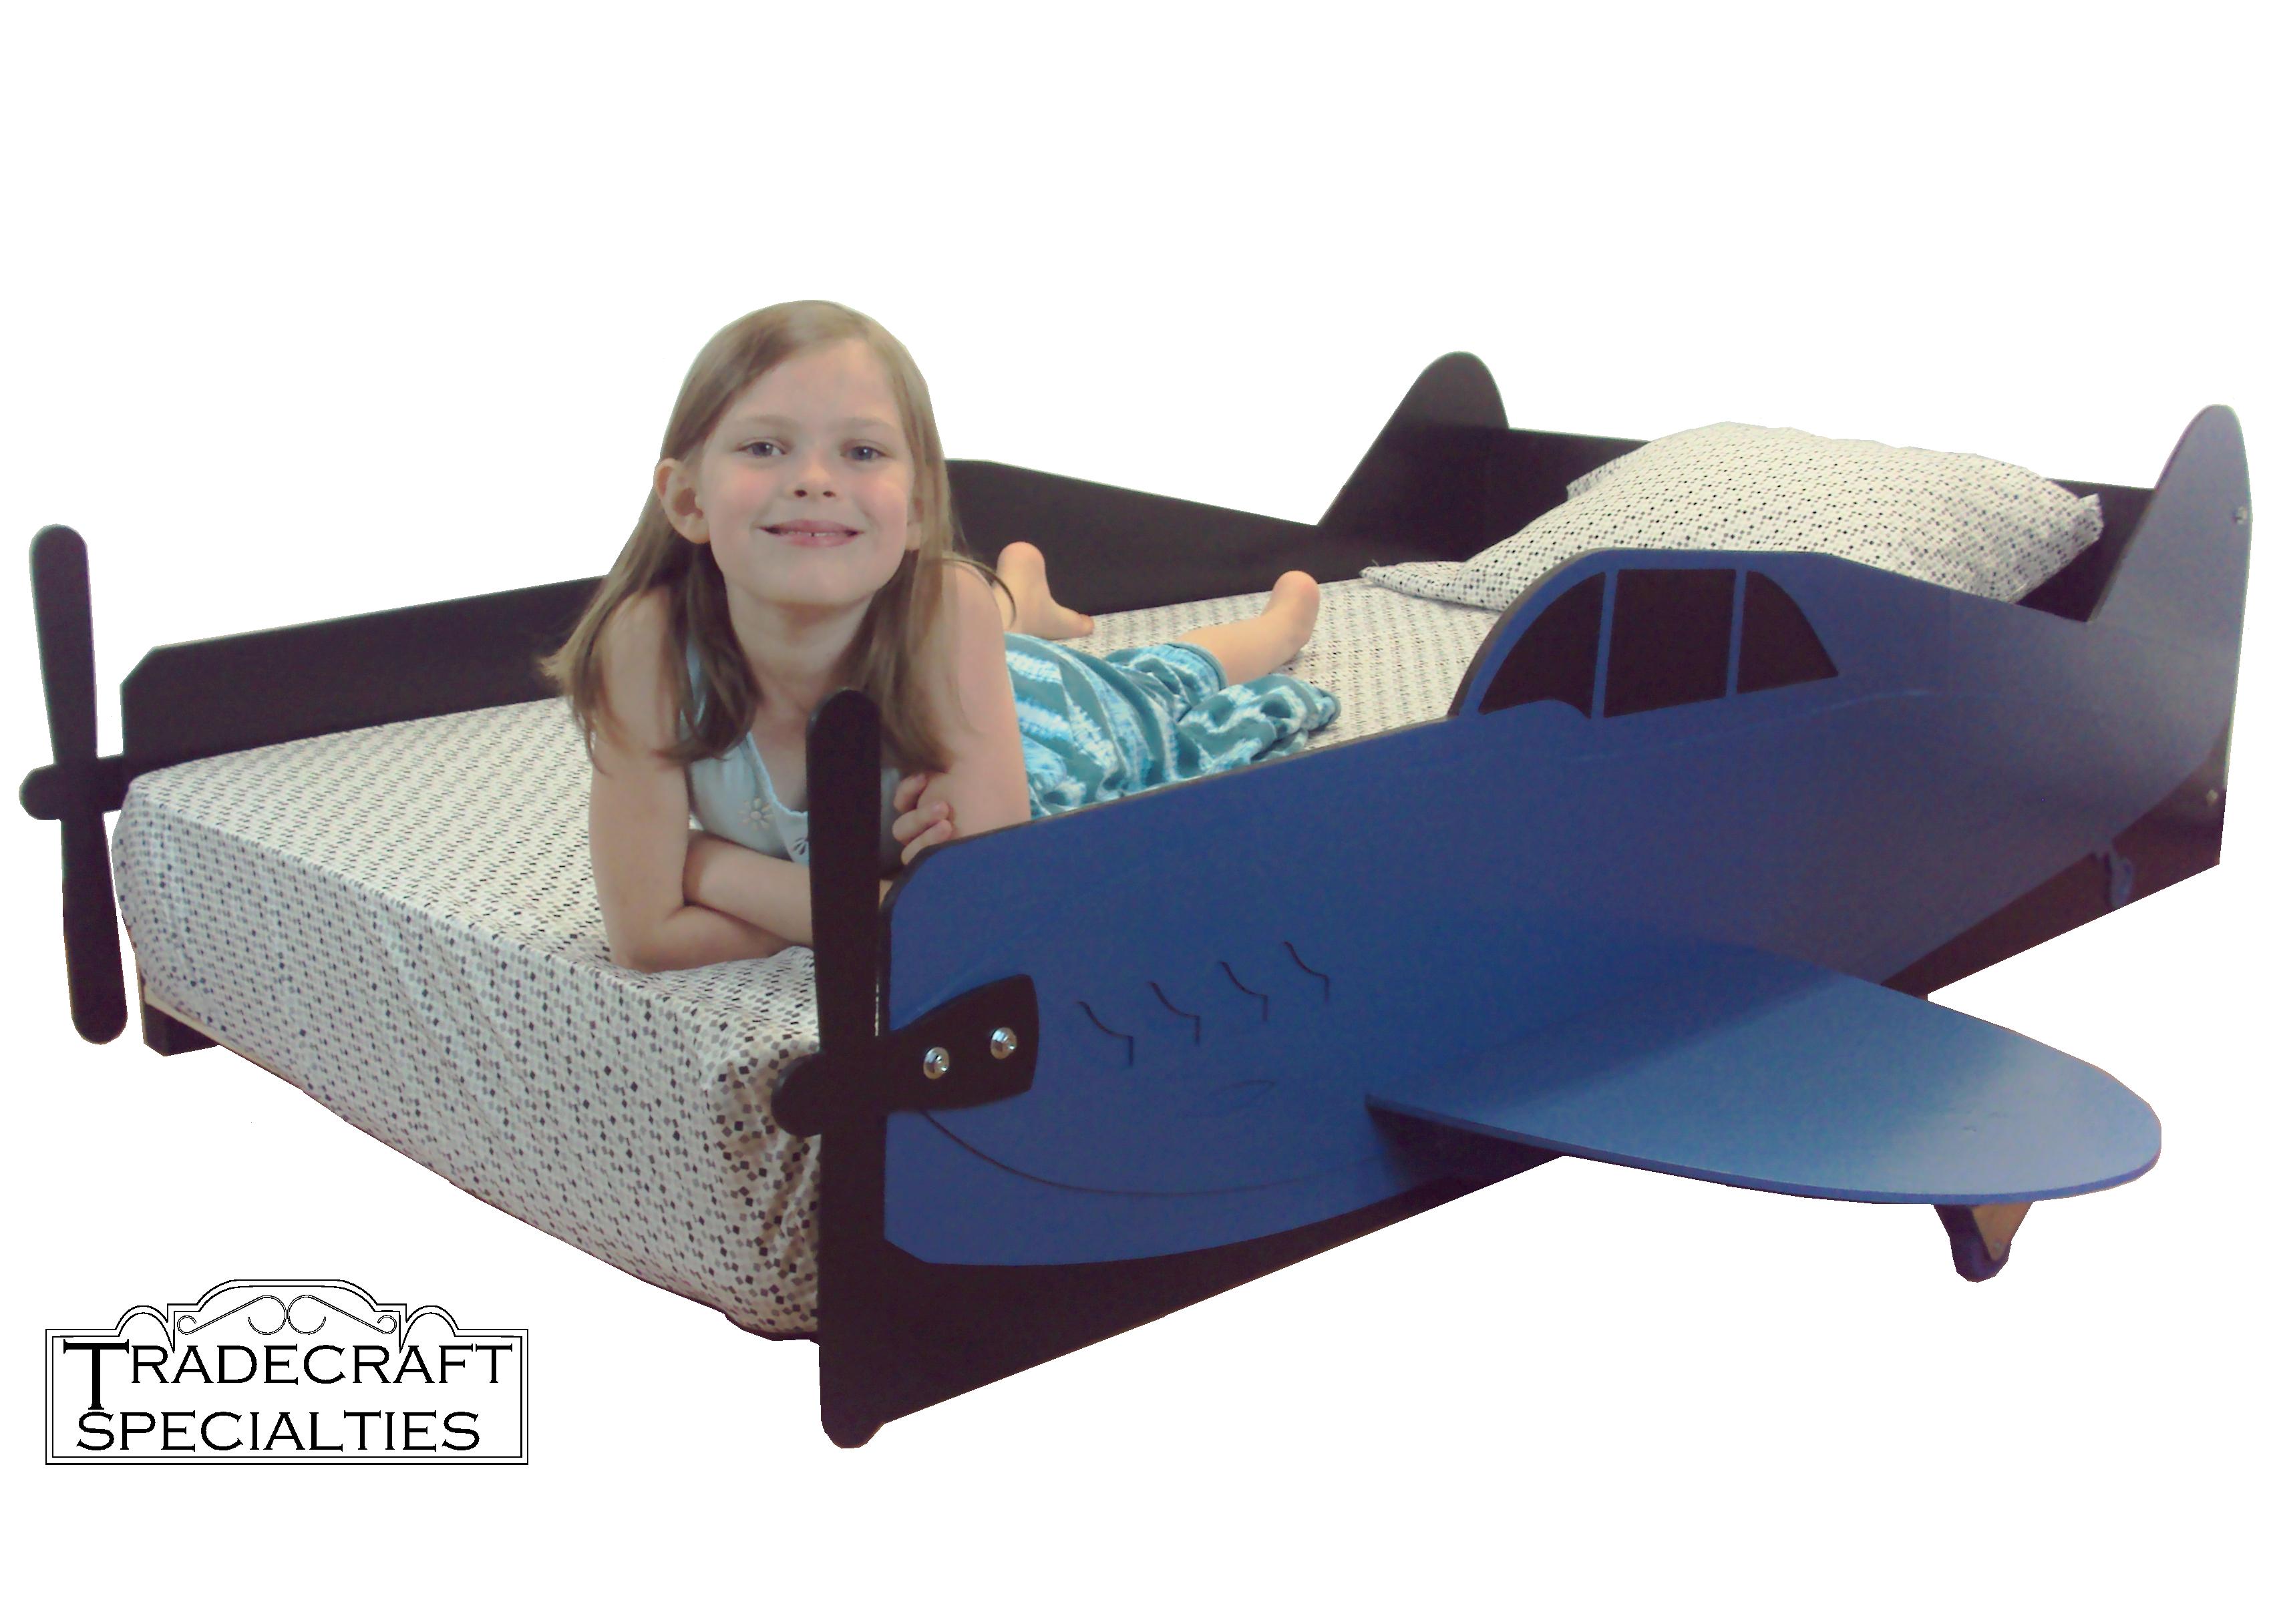 Propeller plane bed